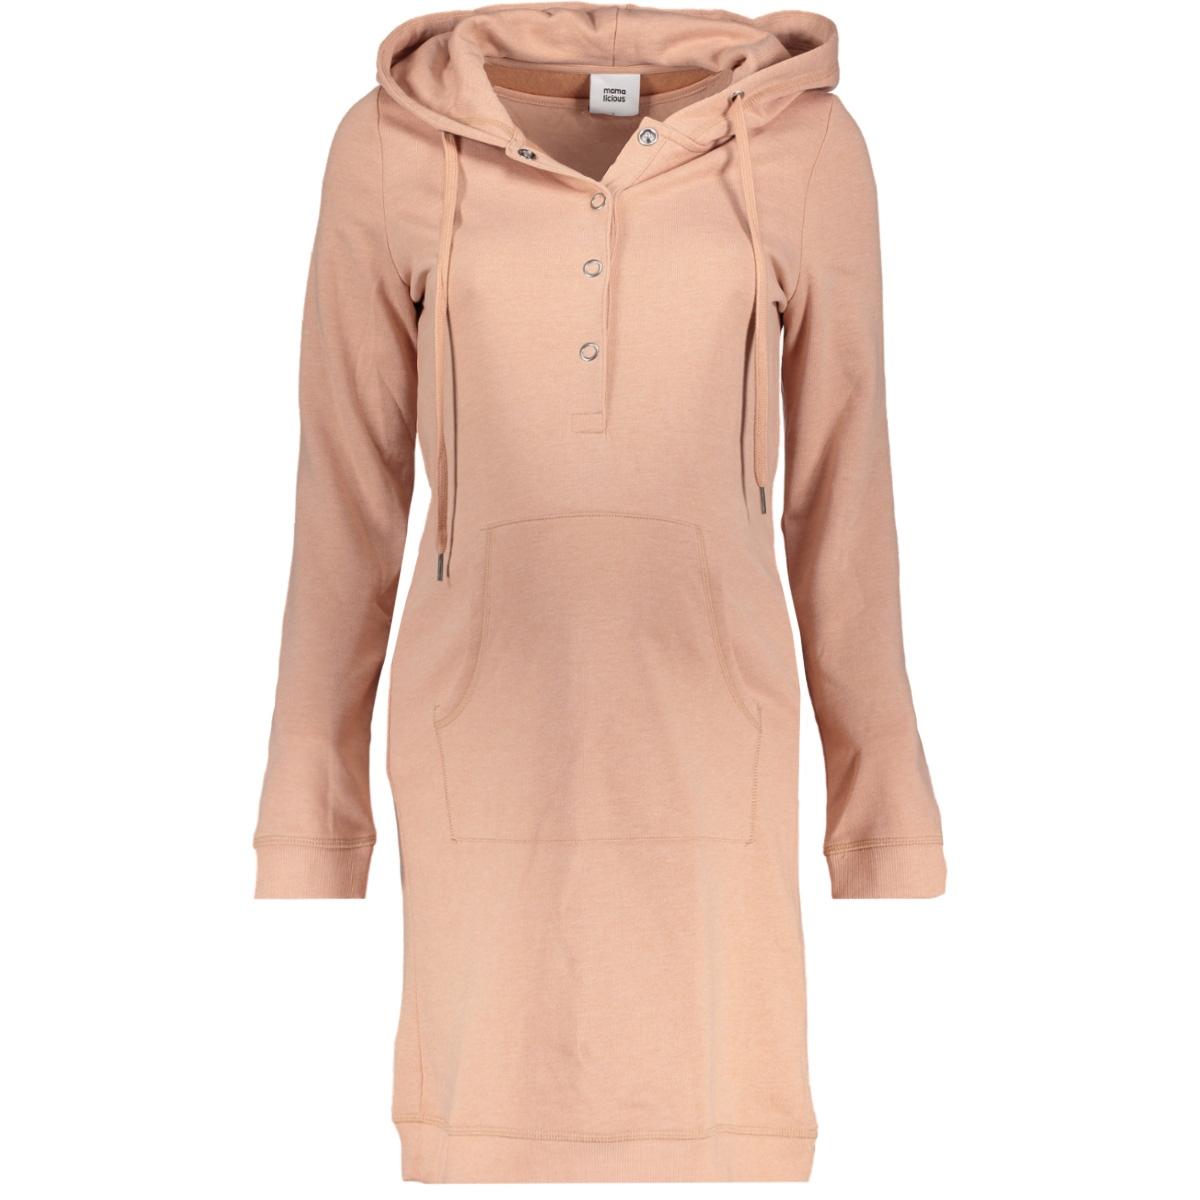 mlkatinka lia l/s jersey dress nf 20008018 mama-licious positie jurk mahogany rose / melange